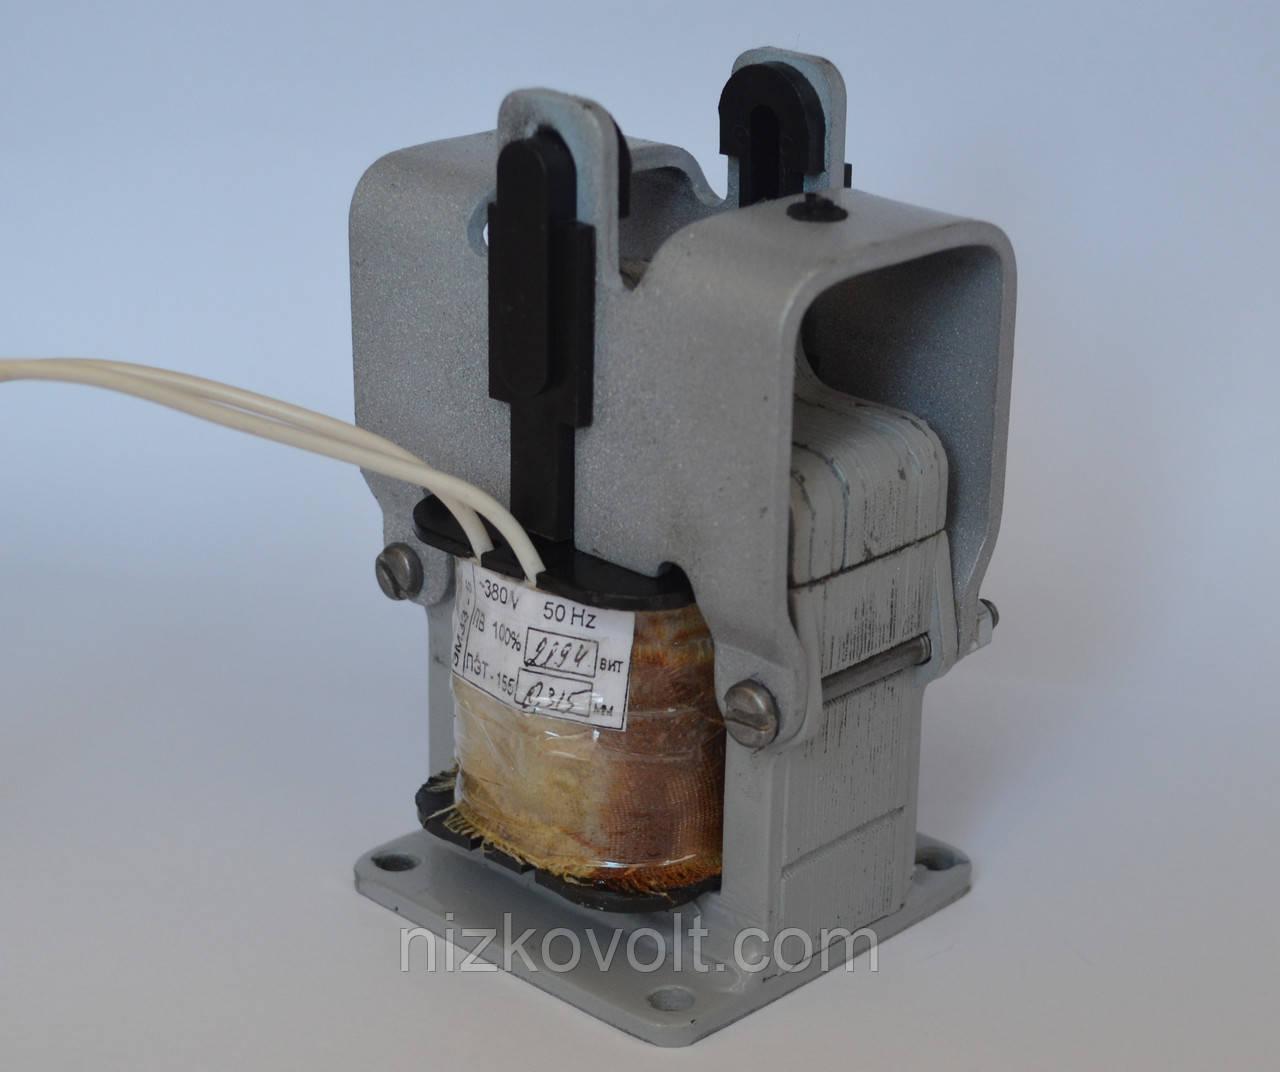 Электромагнит ЭМ 33-5  (ЭМ-33-51311) однофазный